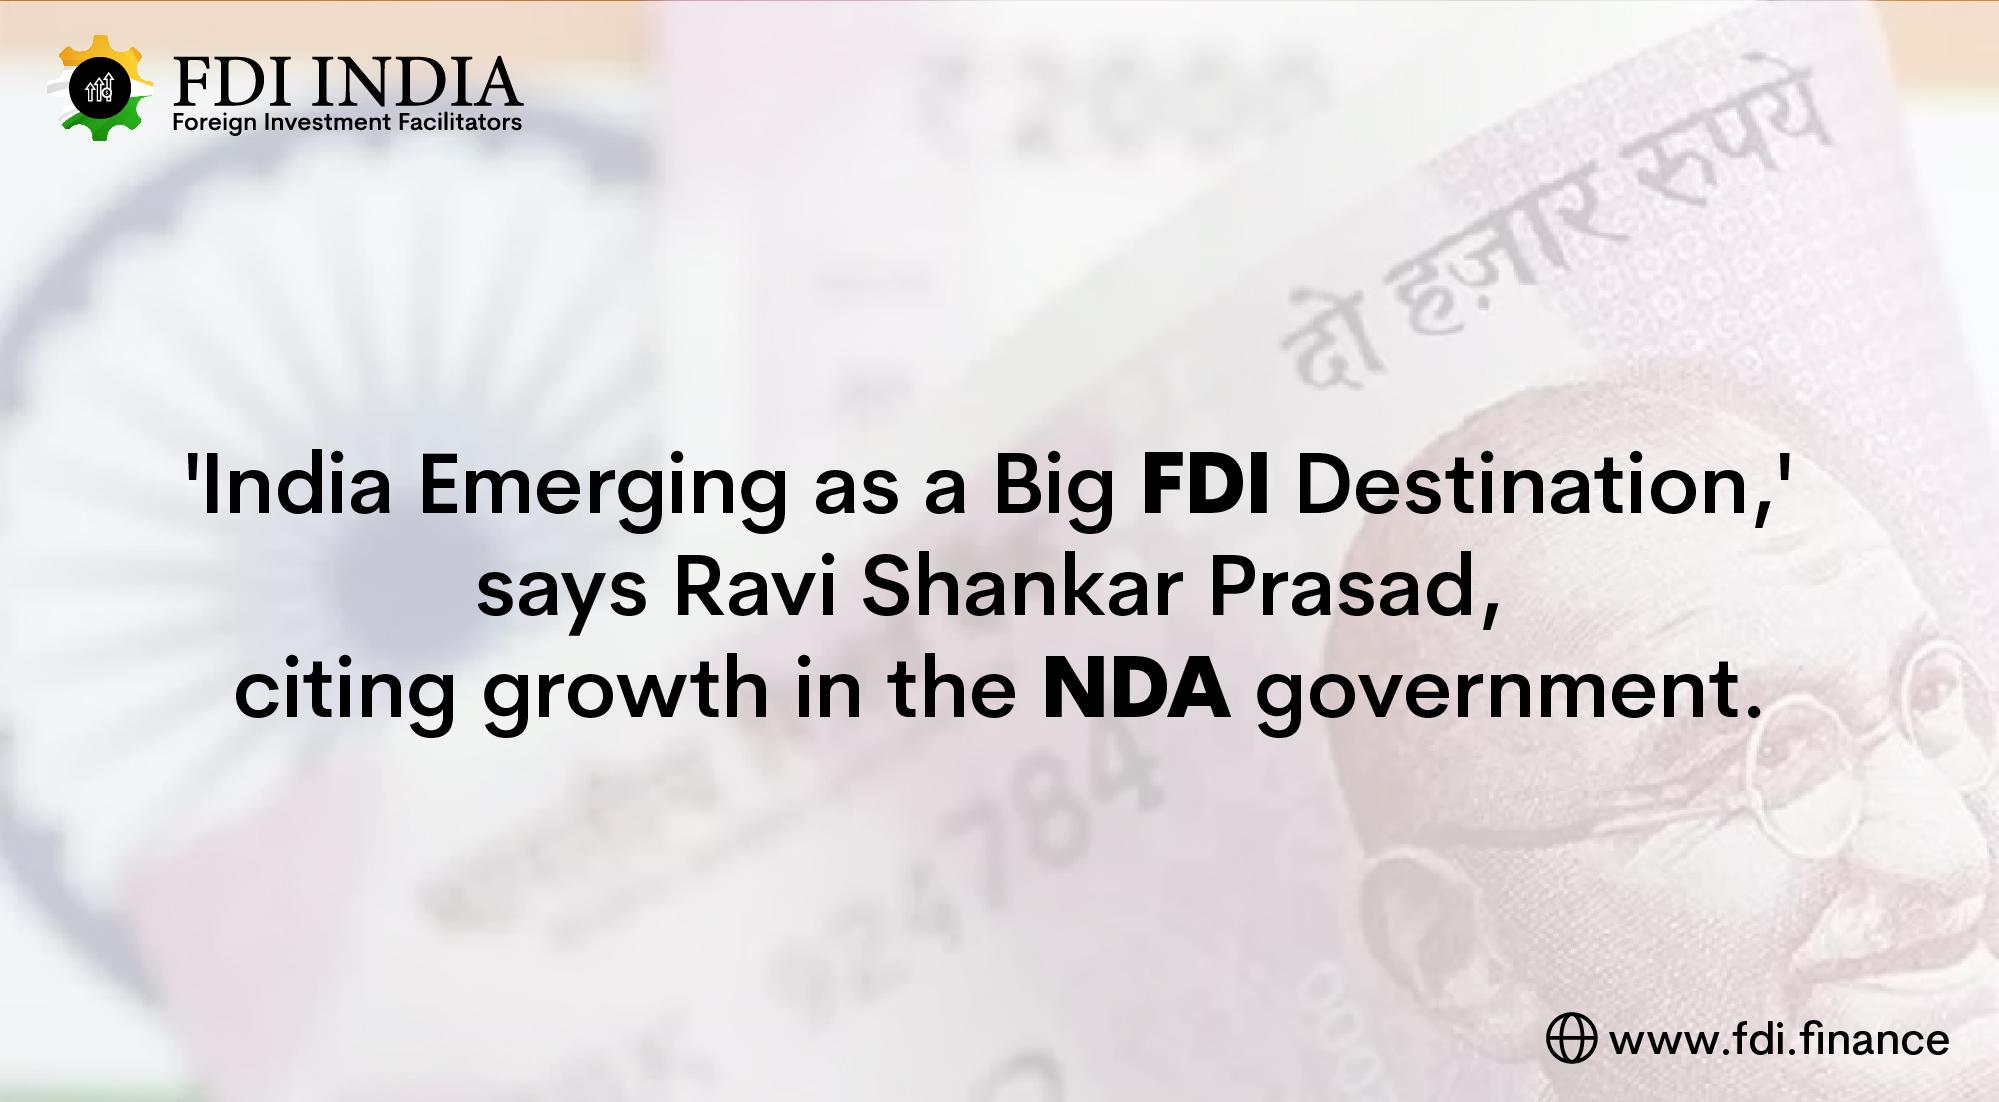 'india Emerging as a Big FDI Destination,' Says Ravi Shankar Prasad, Citing Growth in the NDA Government